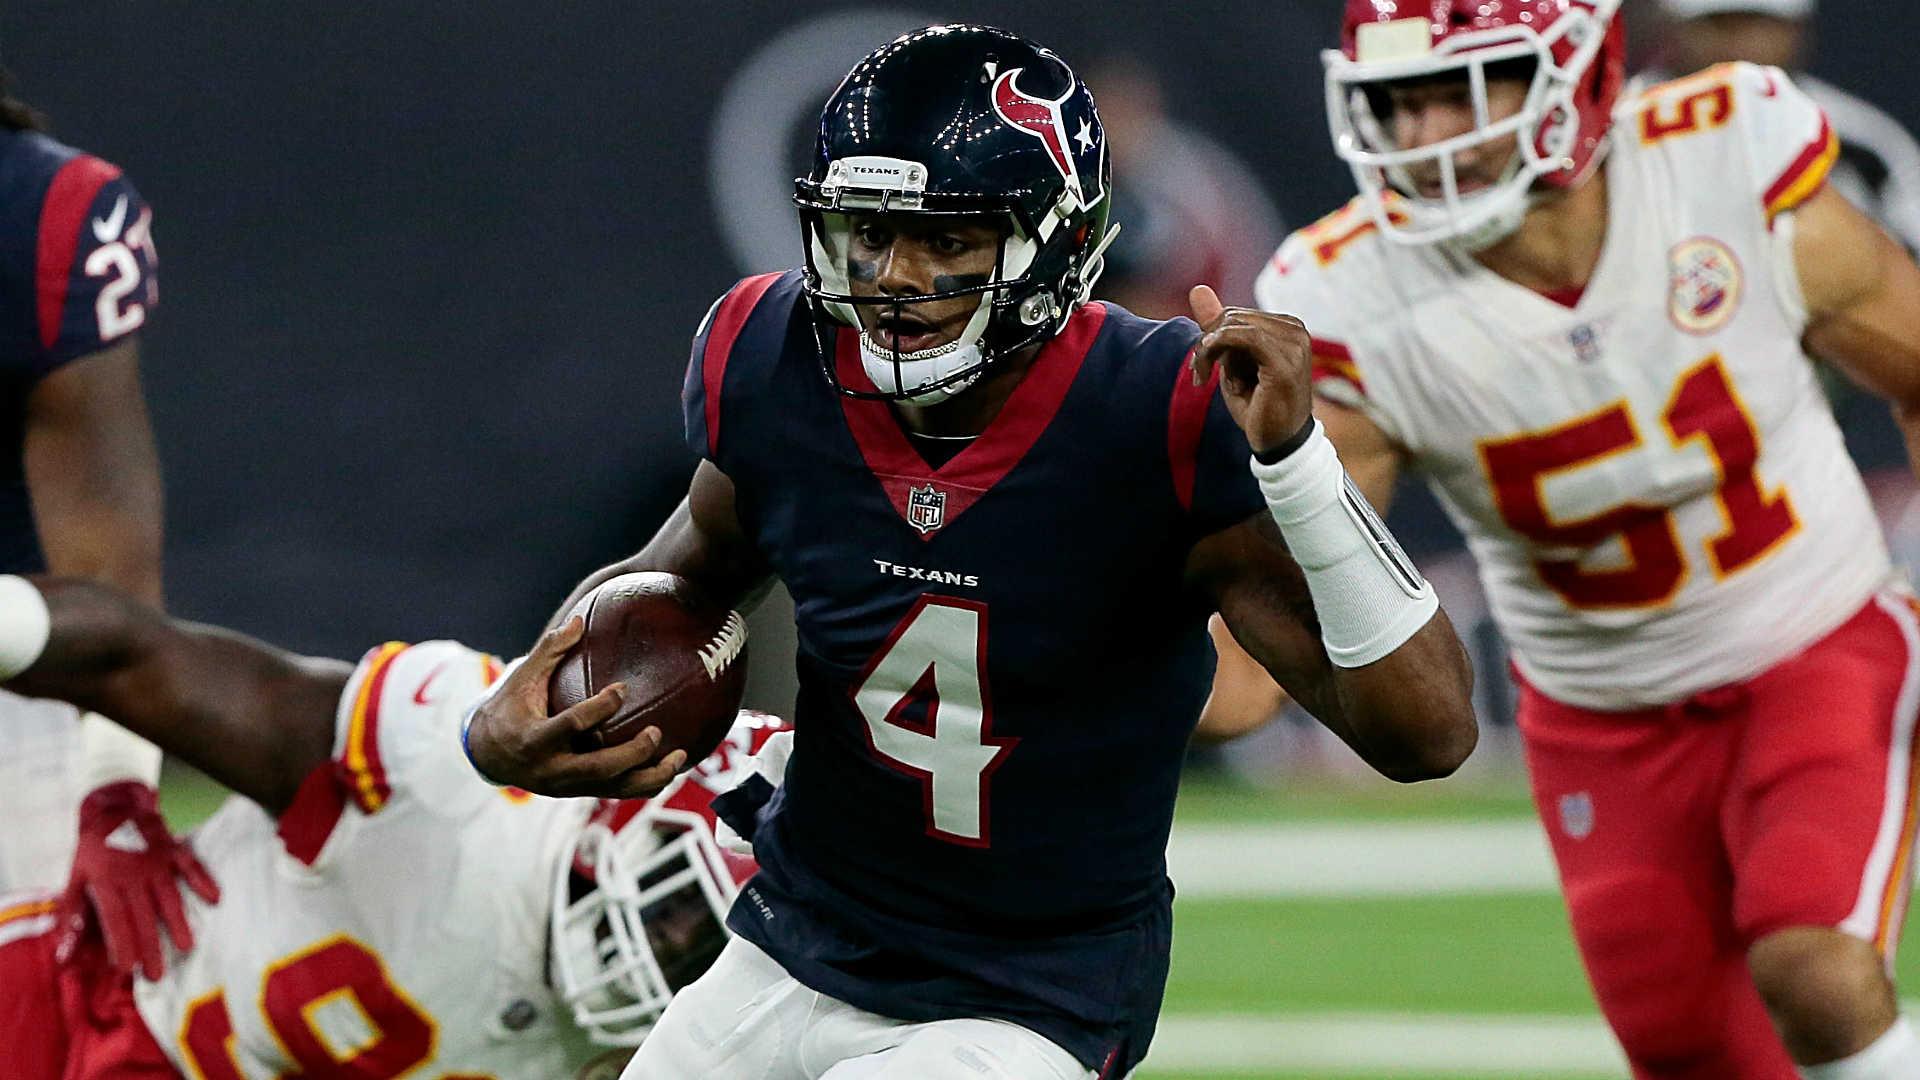 Texans are totally Deshaun Watson's team now